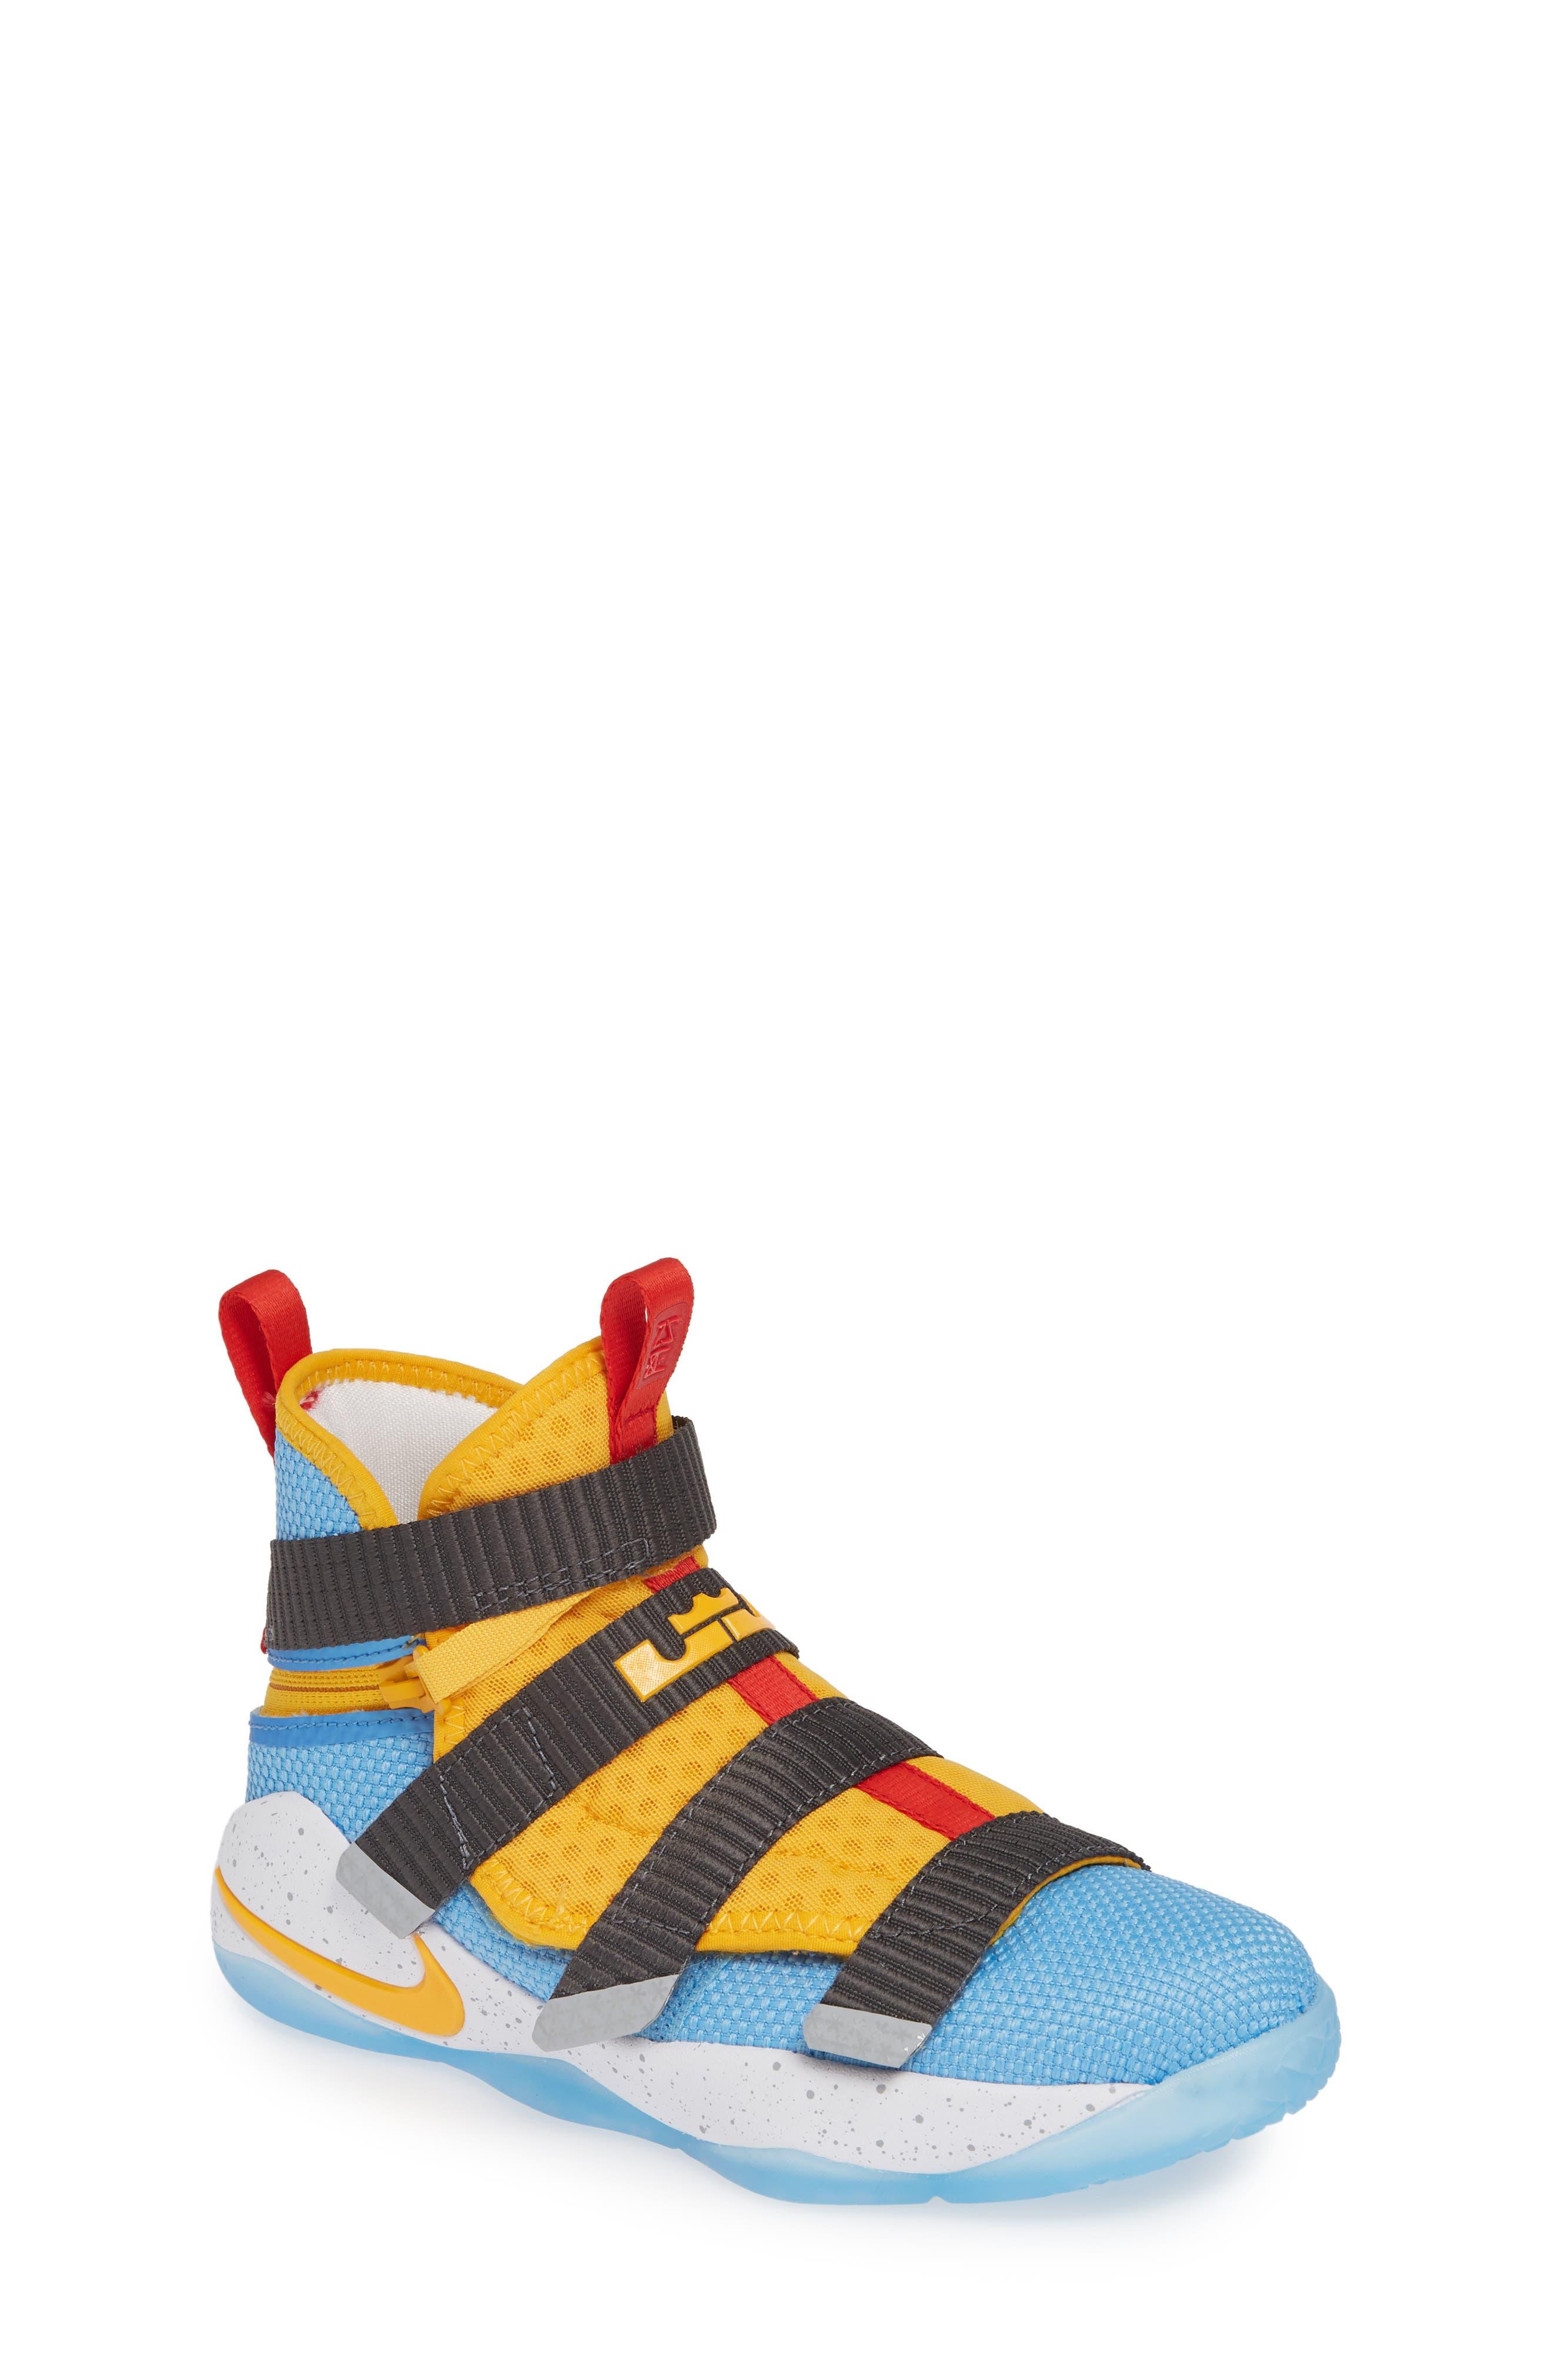 Nike LeBron Soldier XI FlyEase High Top